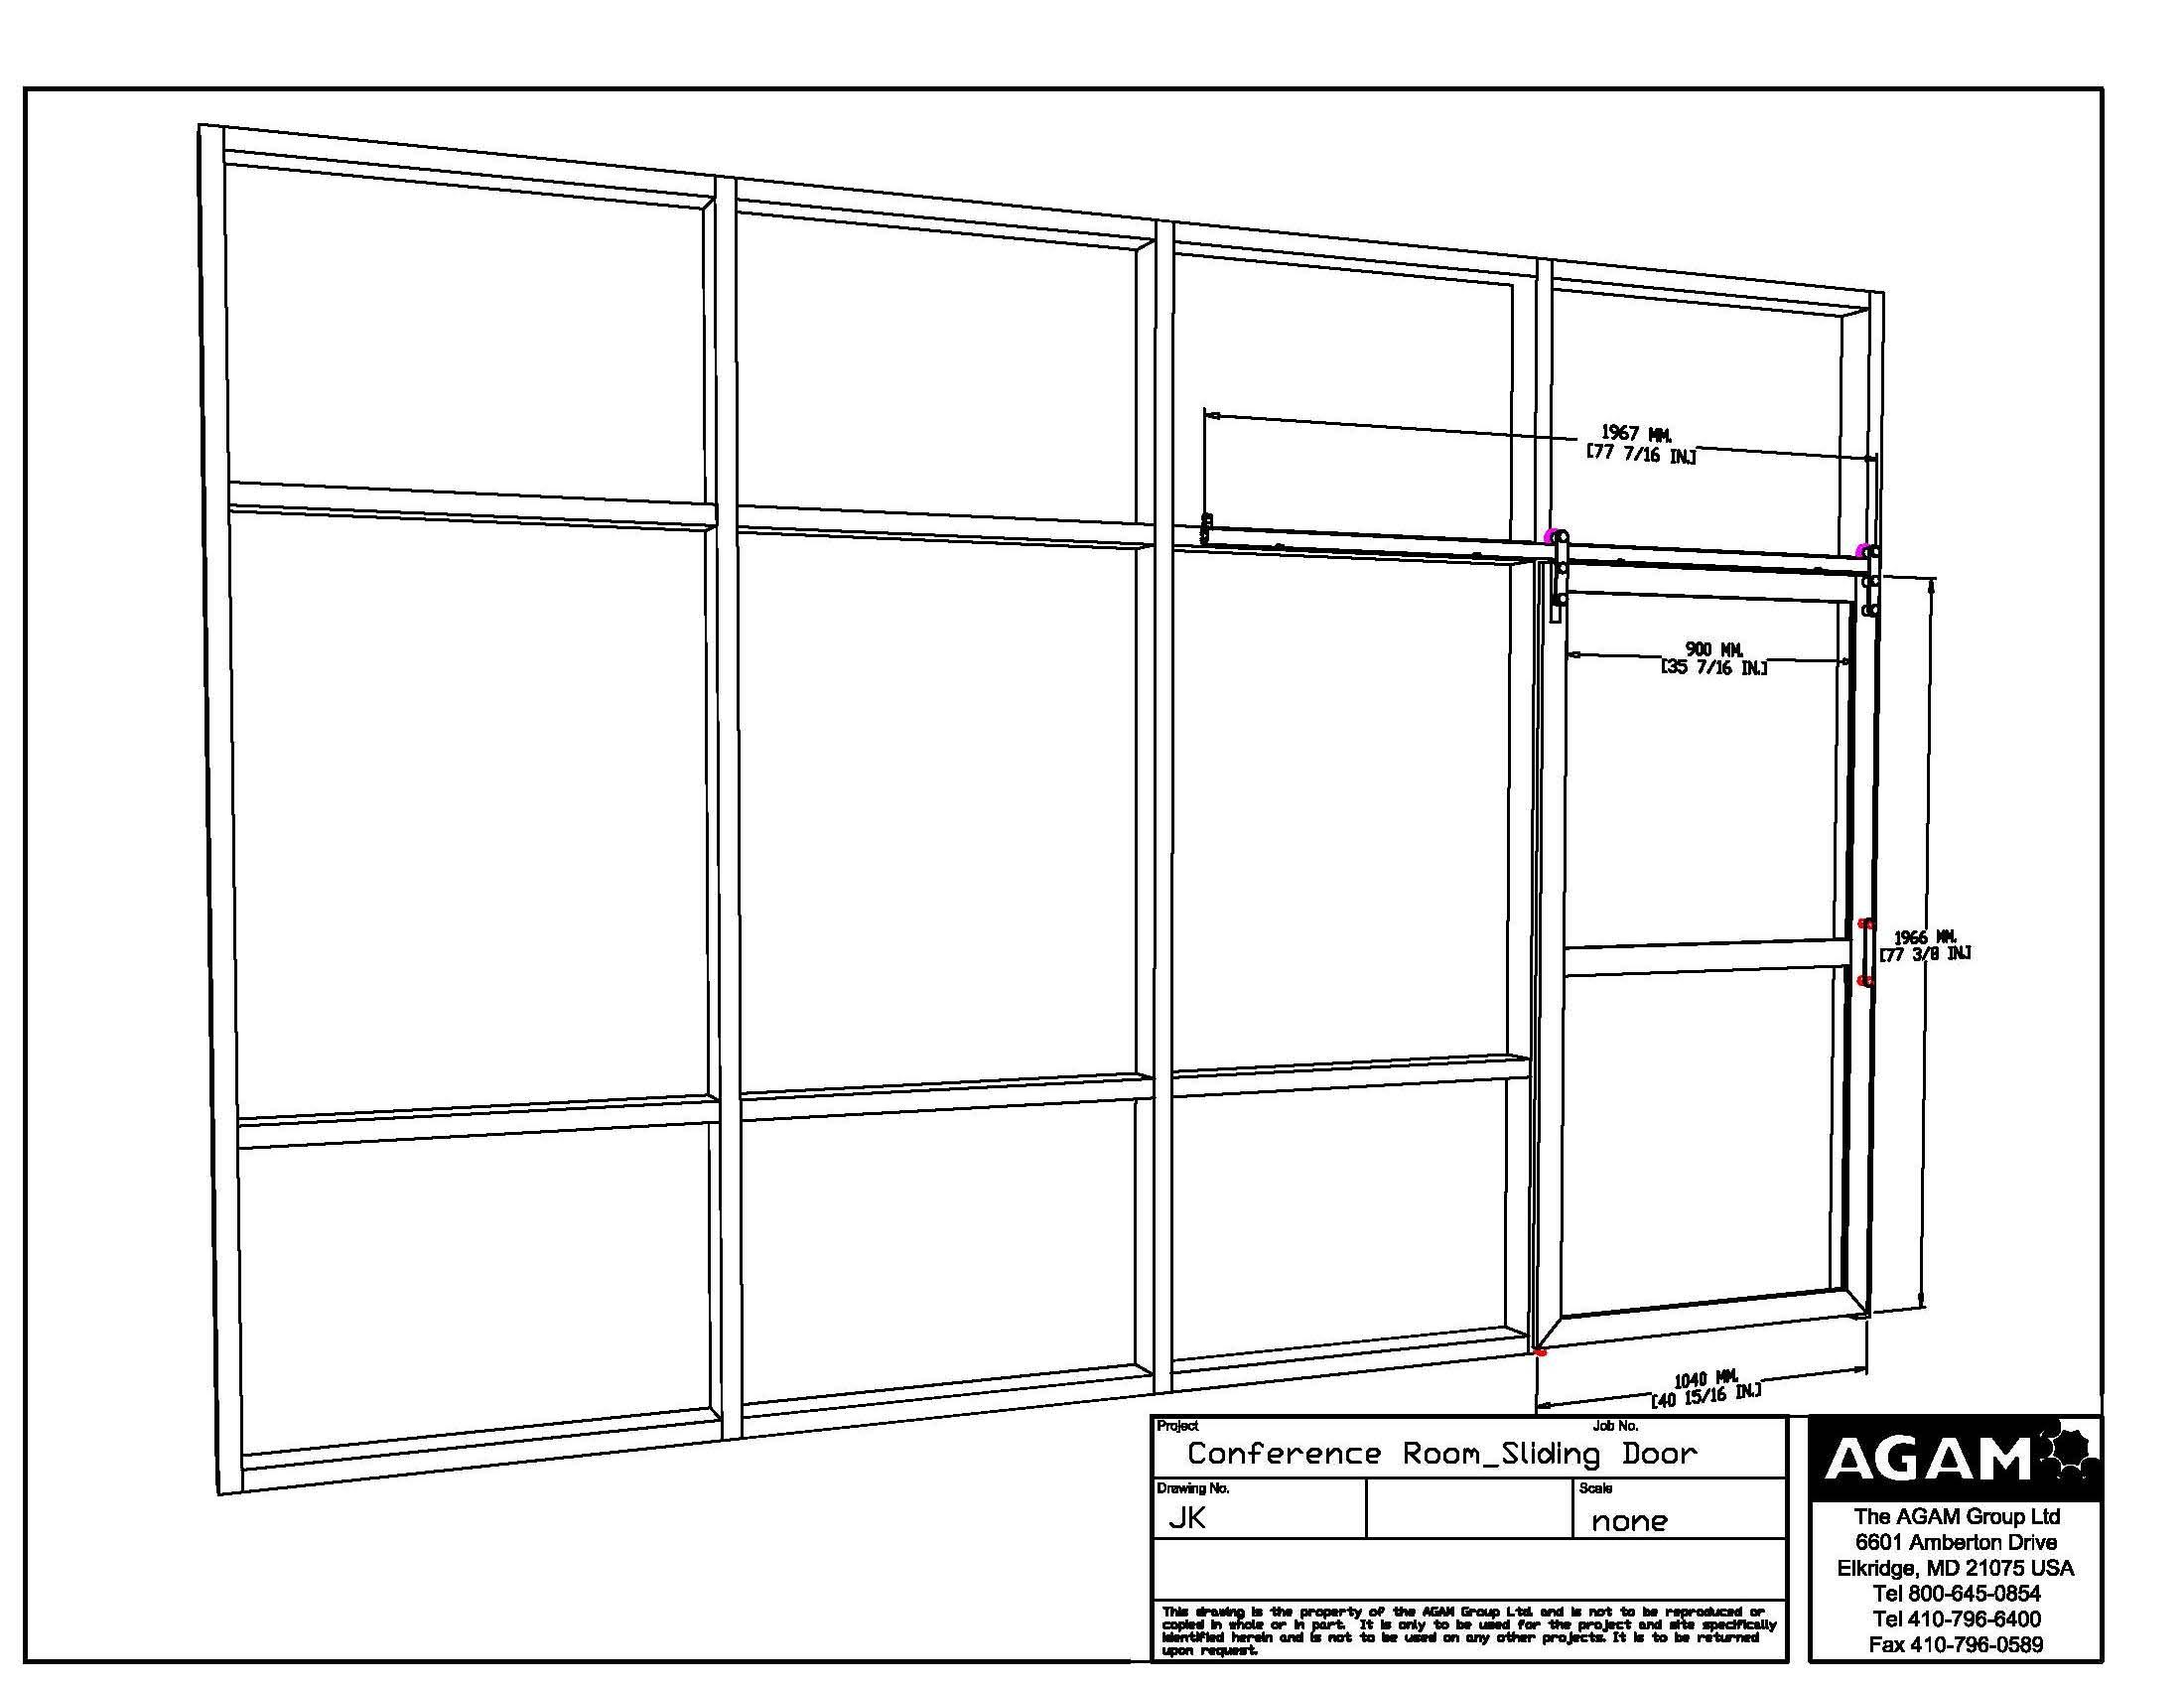 Doors agam blog for Sliding glass doors cad